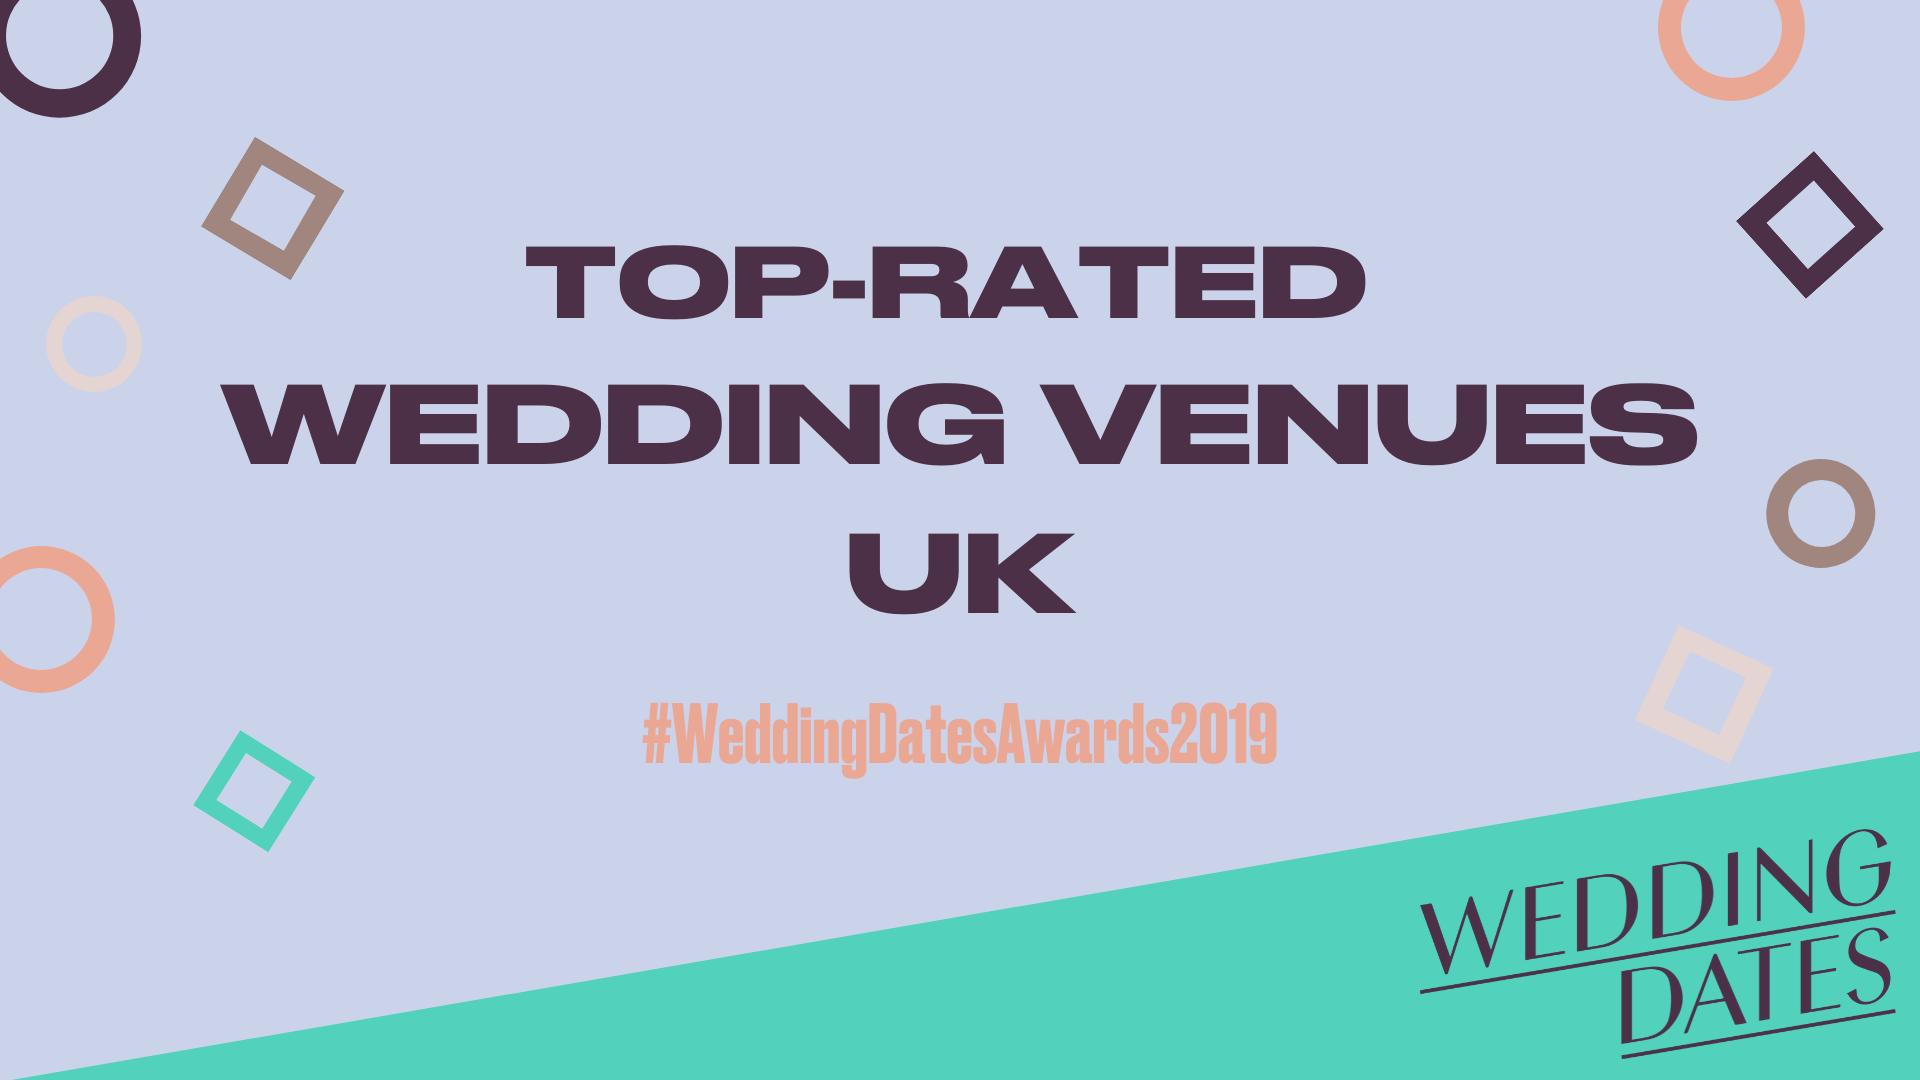 WEDDINGDATES AWARDS 2019 - TOP RATED WEDDING VENUES ANNOUNCED